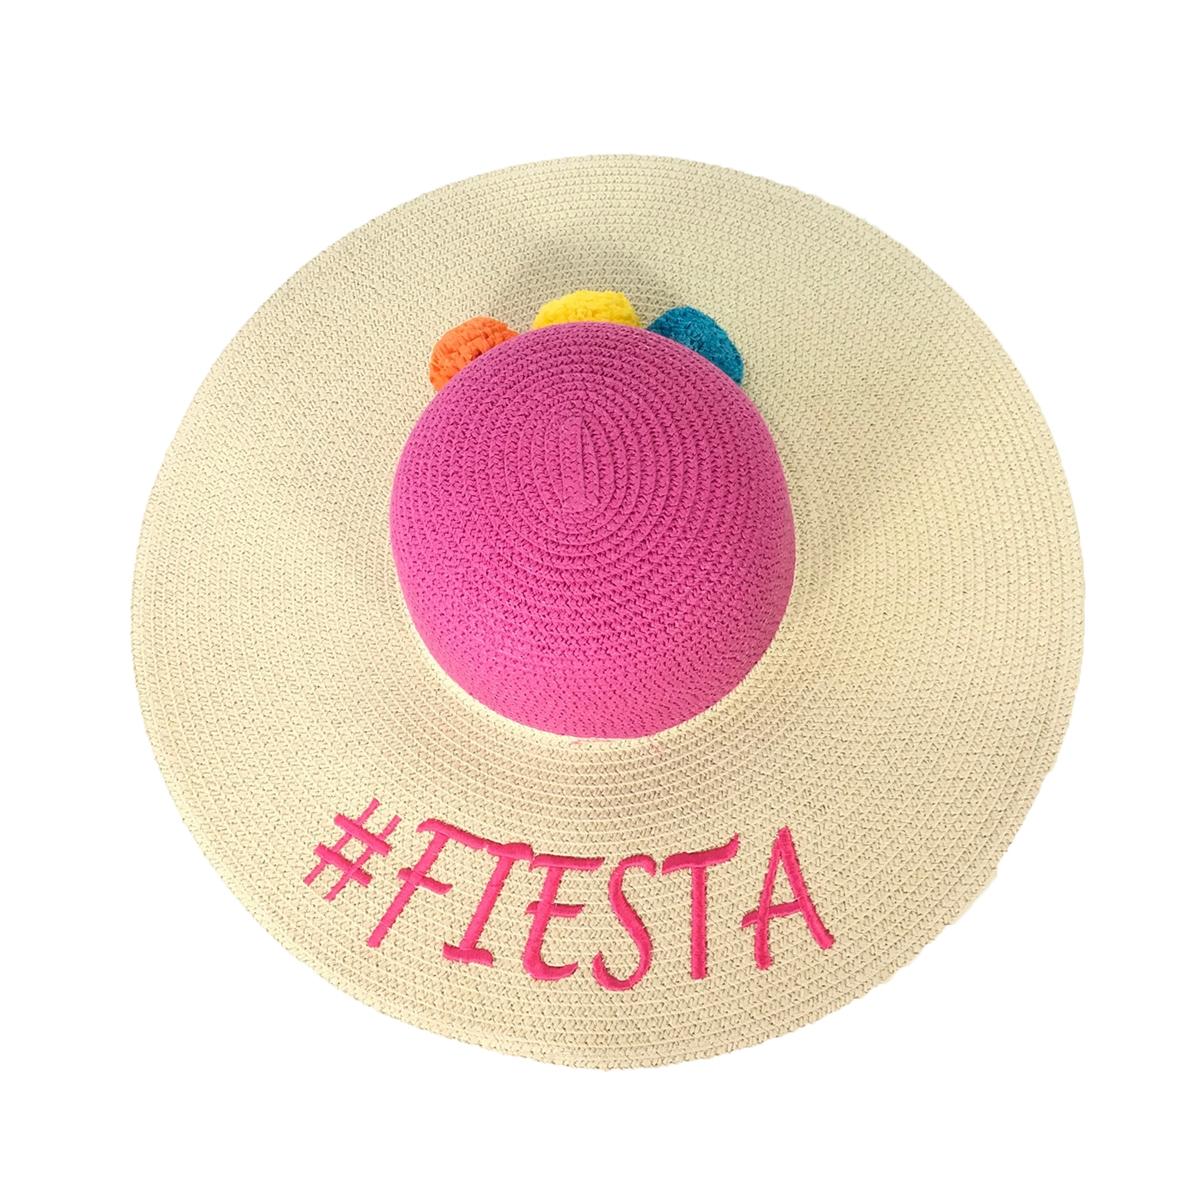 614b7cb7 Magid #Fiesta Floppy Straw Sun Hat, Multi